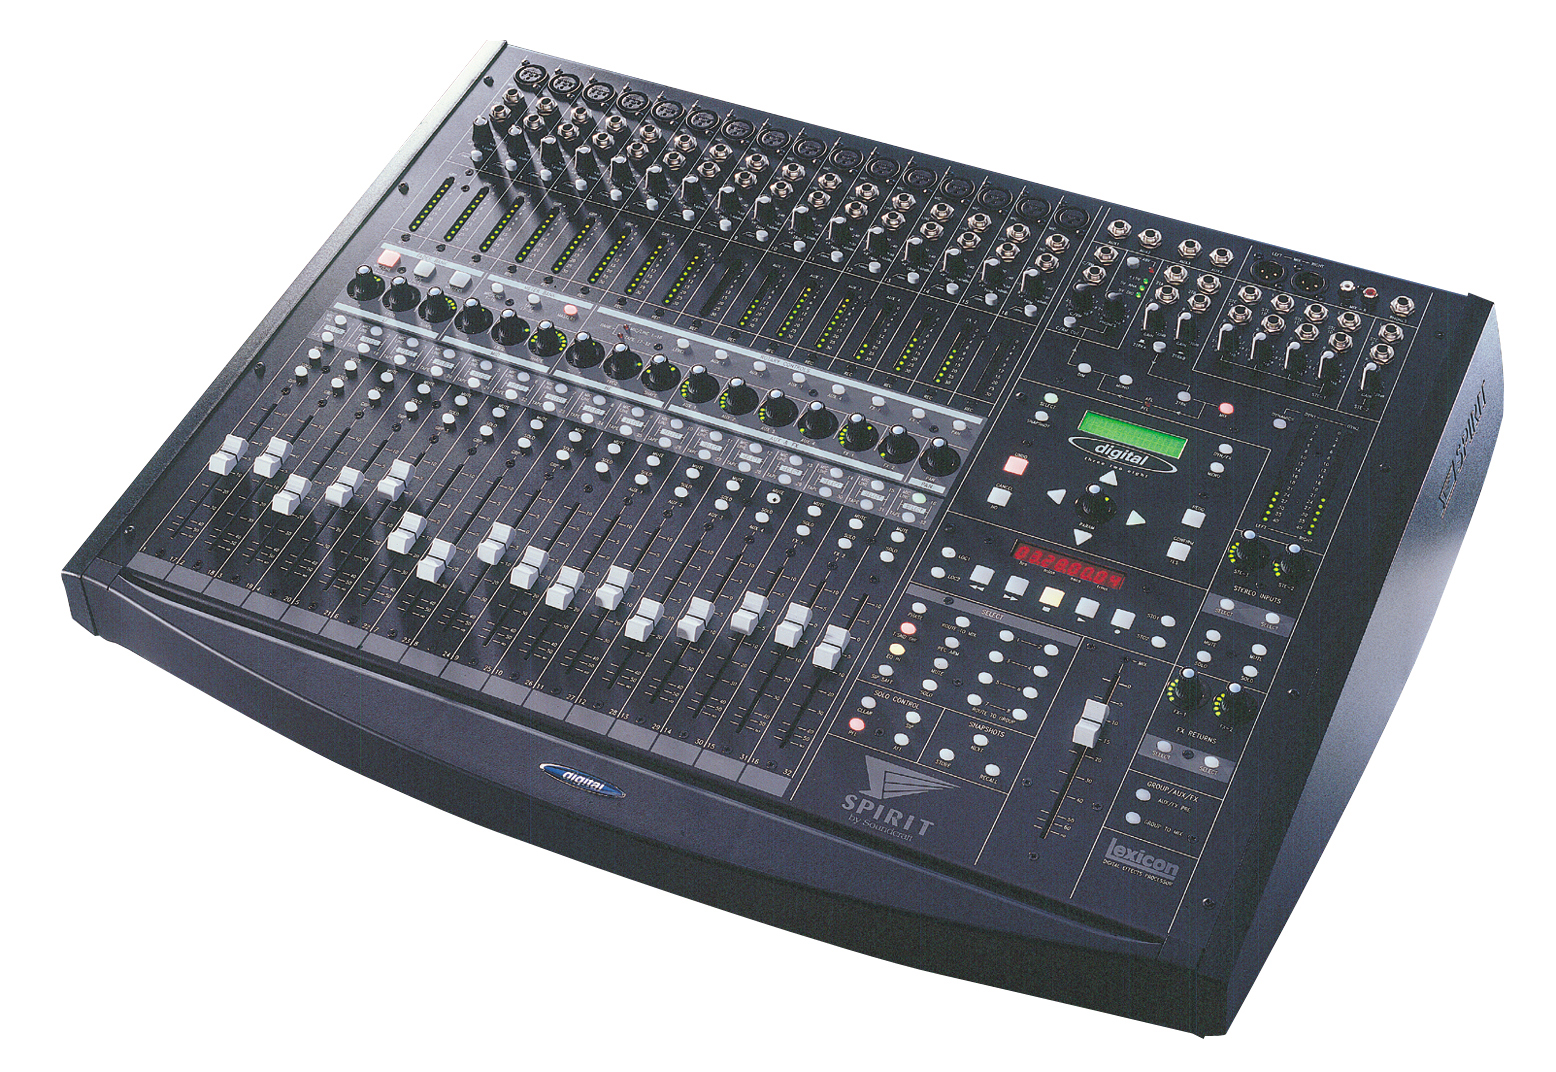 spirit digital 328 soundcraft professional audio mixers rh soundcraft com Soundcraft Spirit Live 4 2 Spirit Band Live